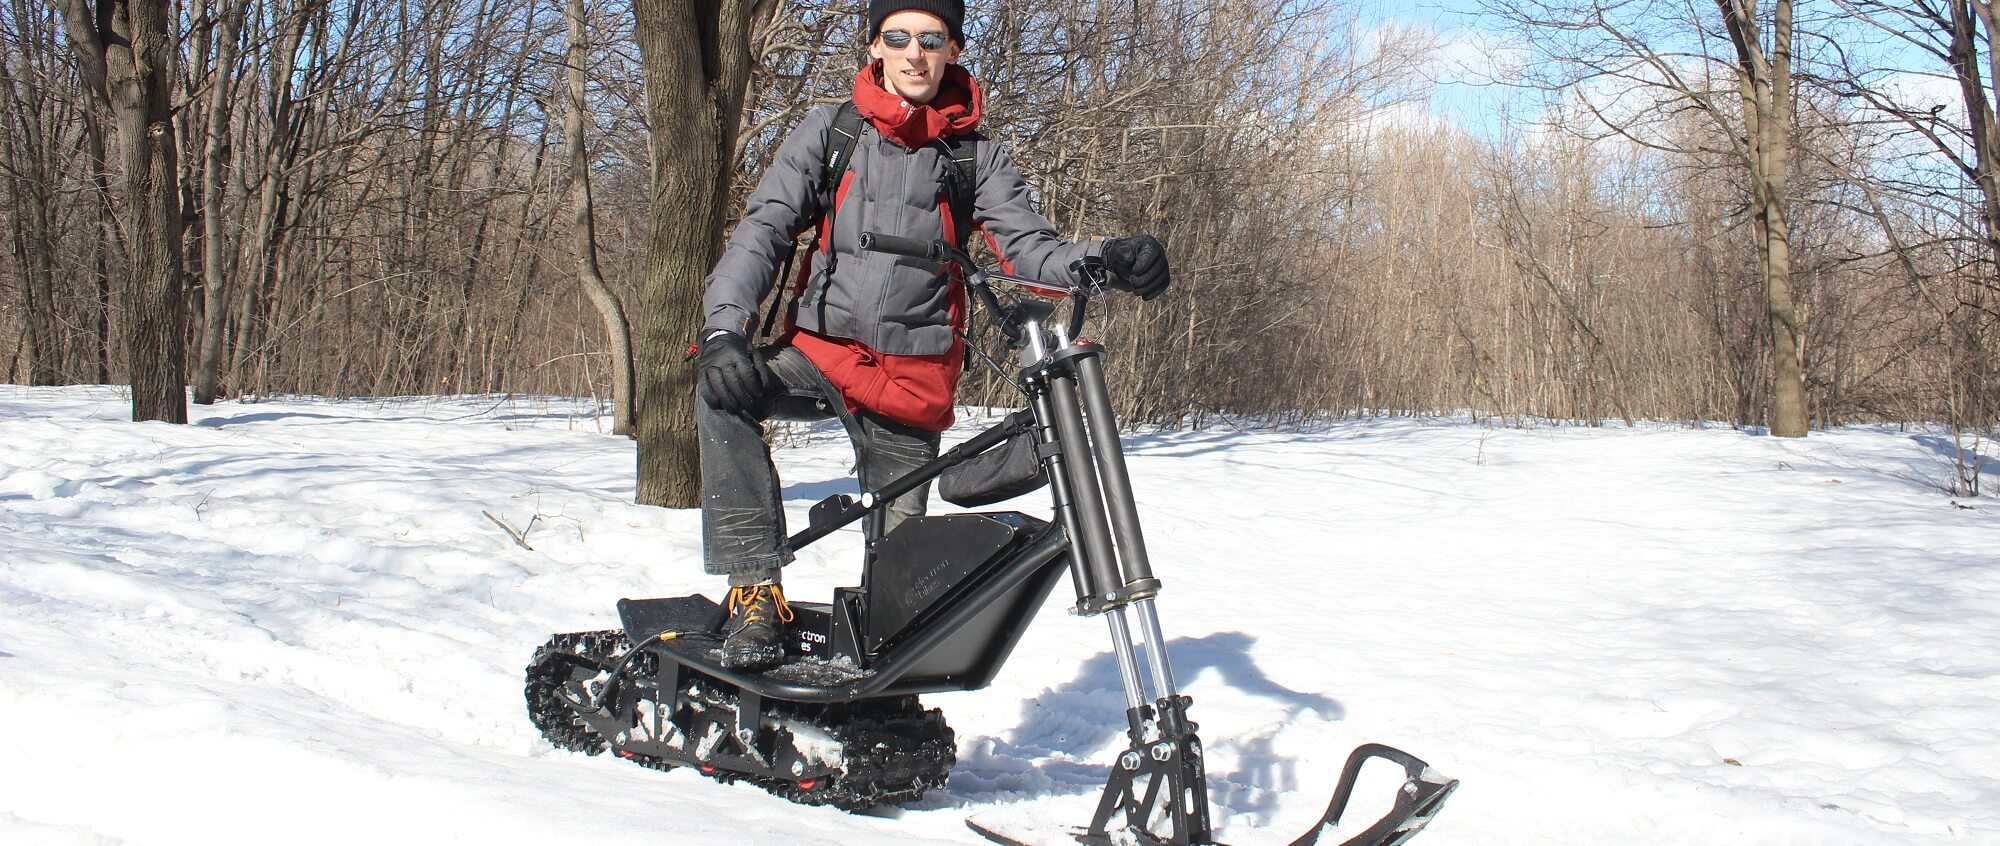 Elecrtric-snowbike_slider_8